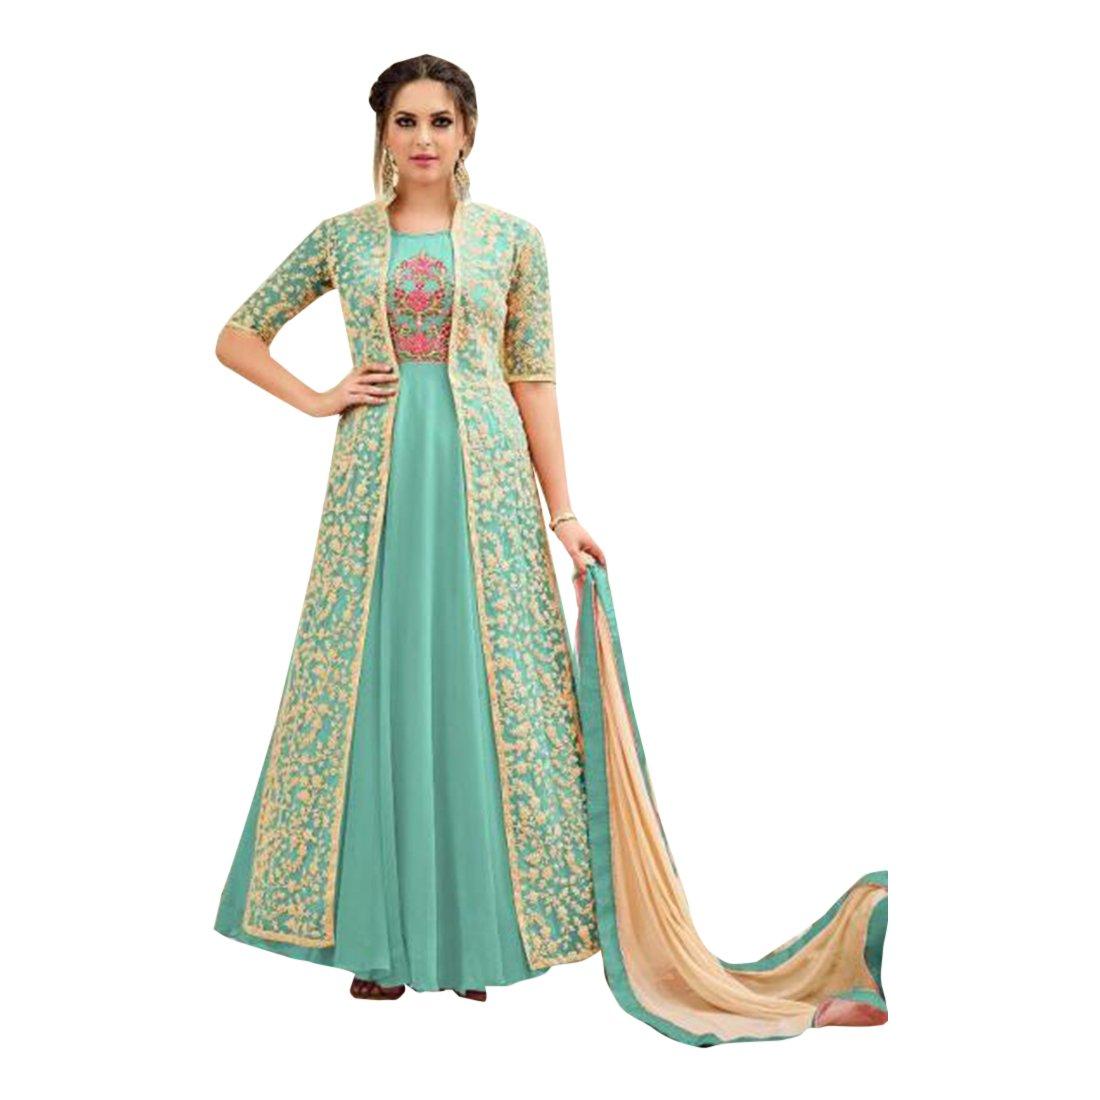 Amazon.com: Eid Bollywood ceremonia de boda Longitud Hasta ...